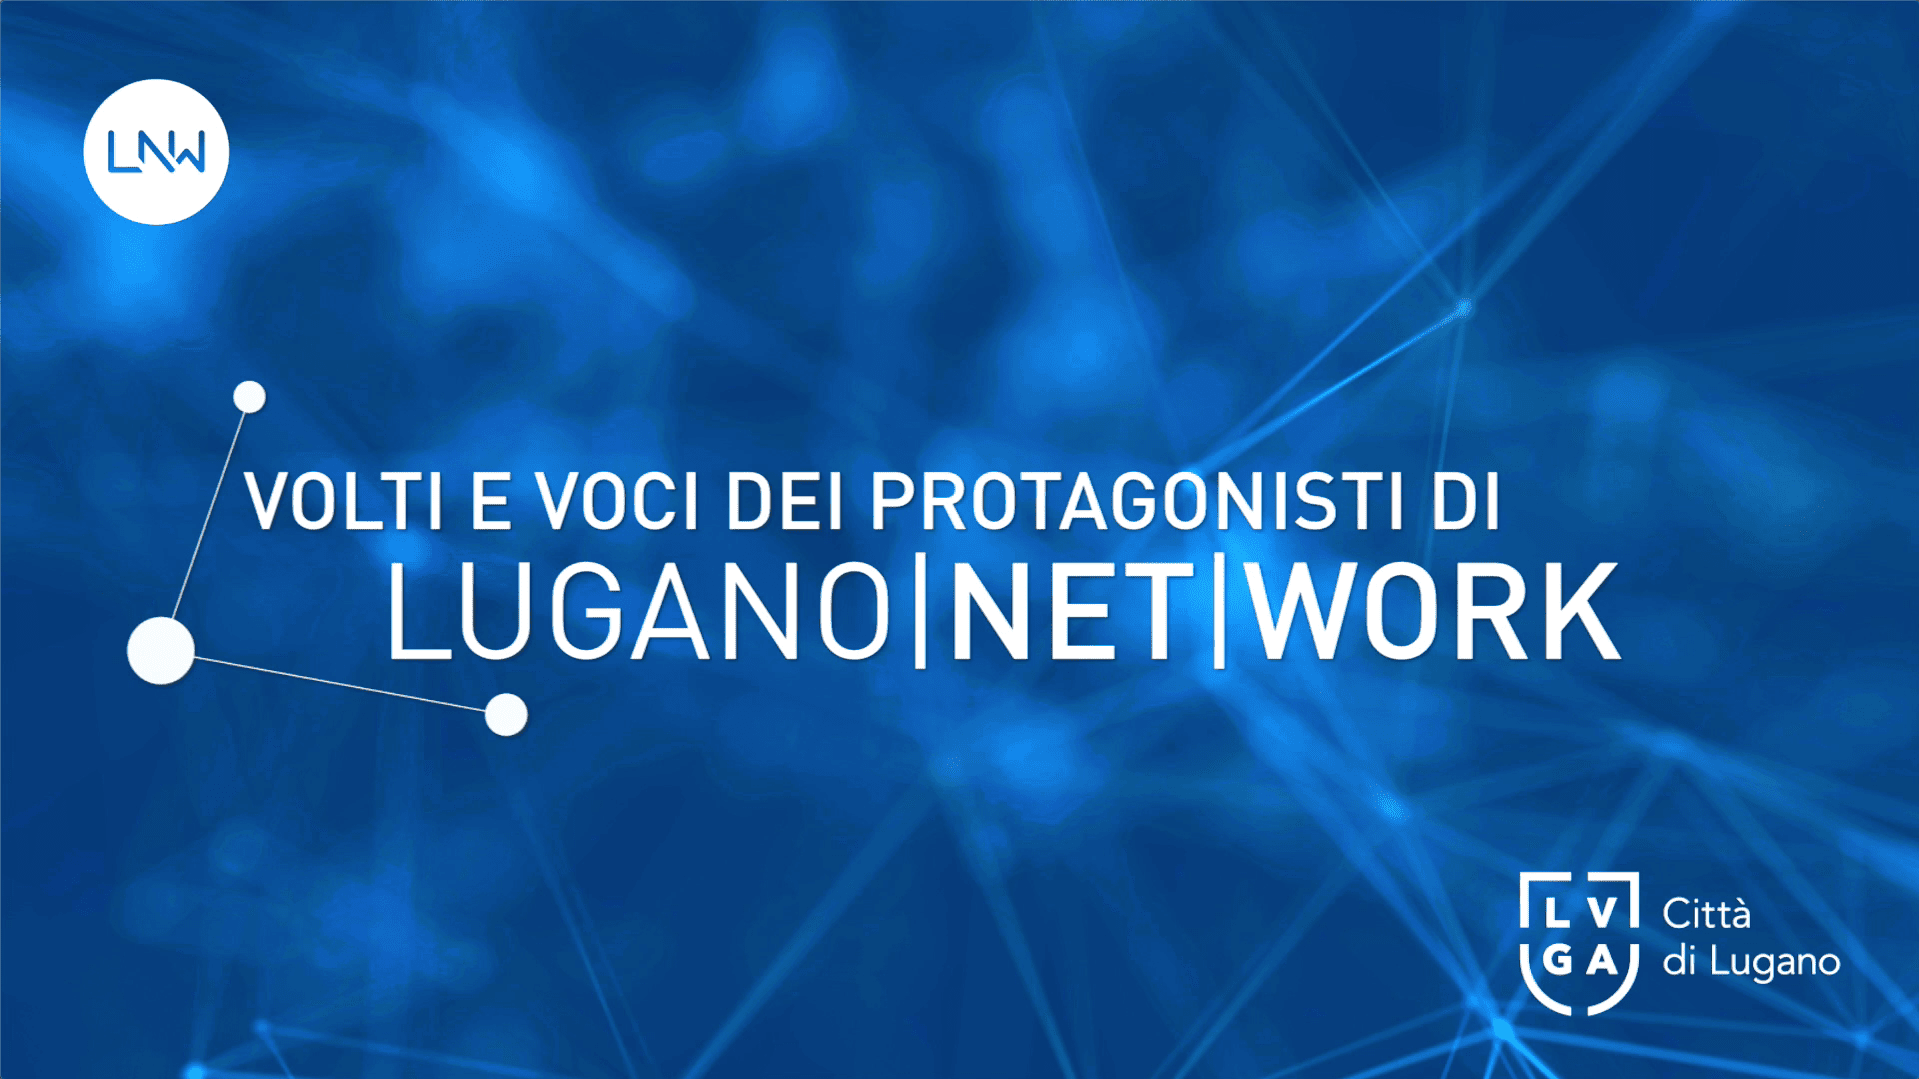 Lugano newtwork